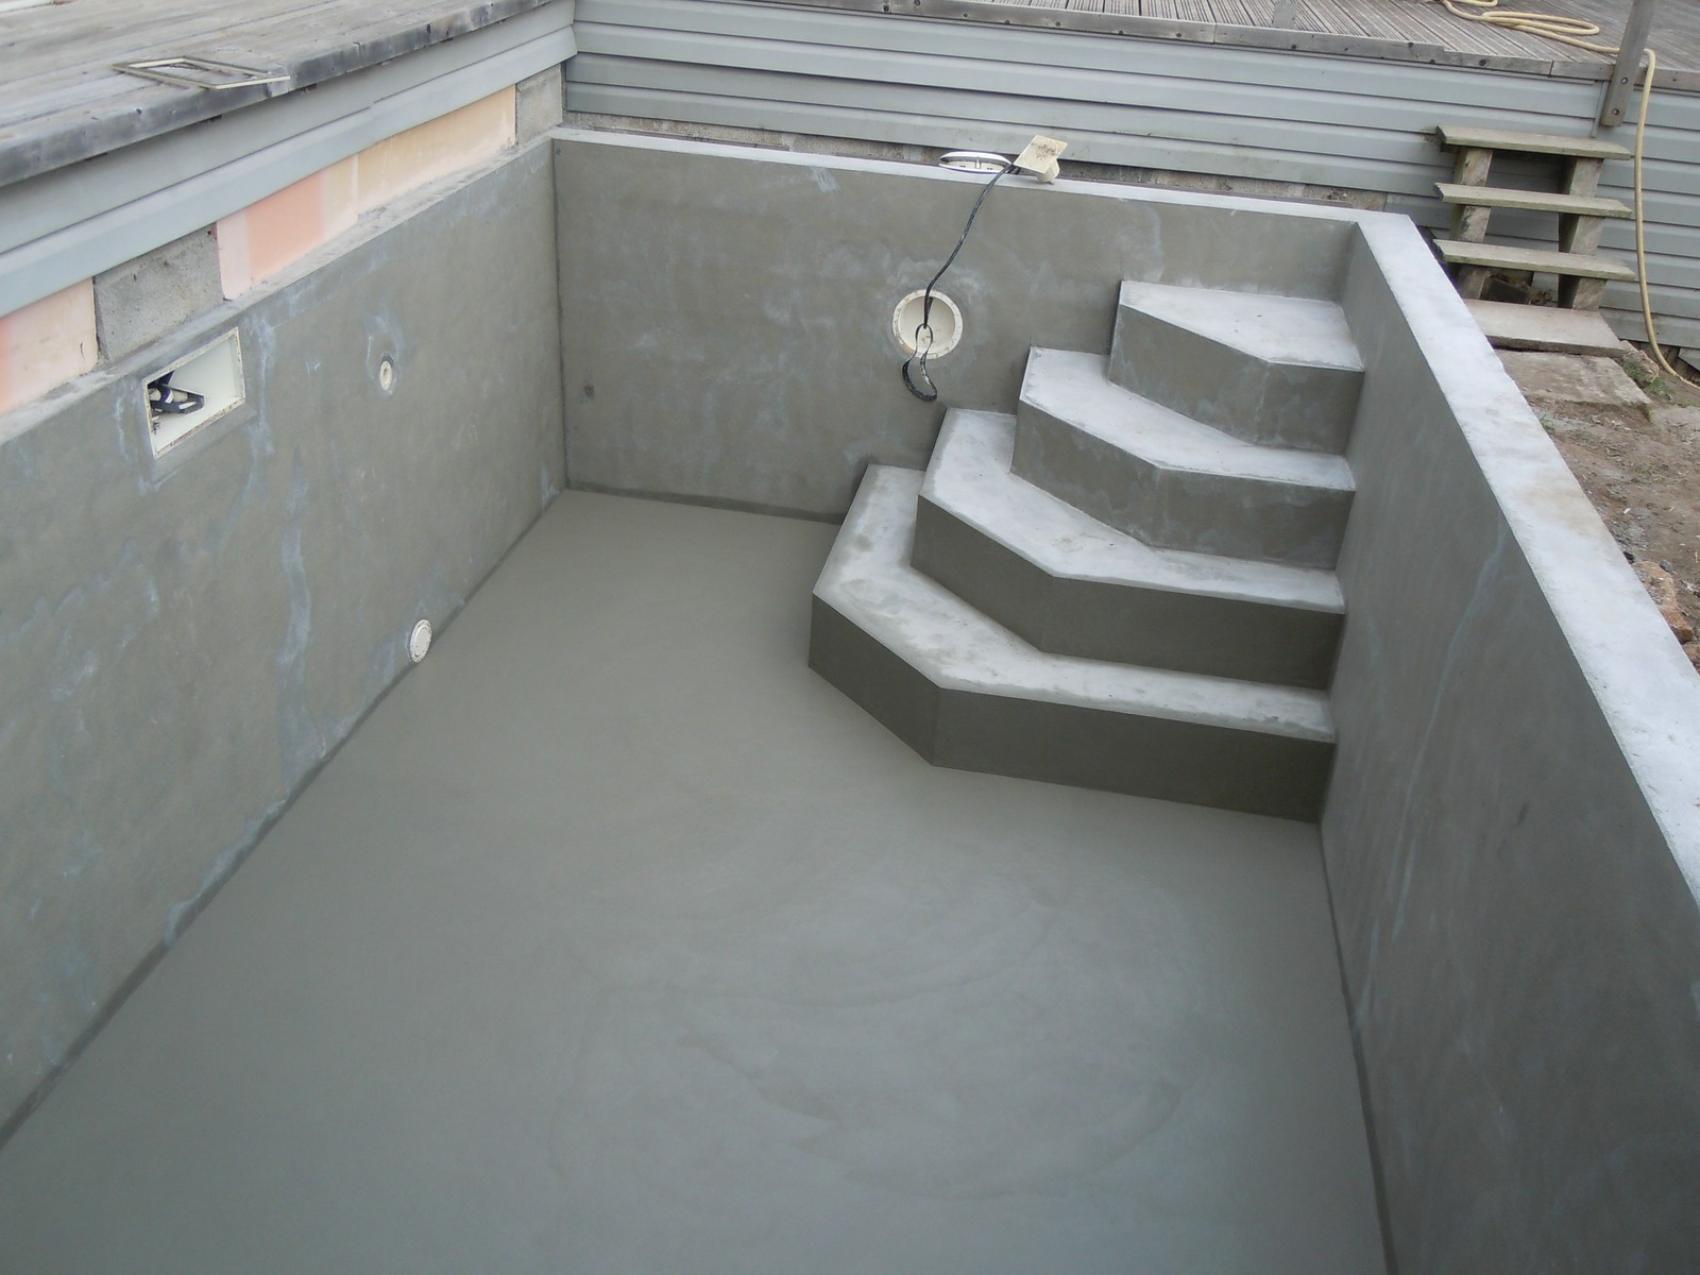 Aydin construction sp cialiste ma onnerie piscines for Construction piscine la rochelle